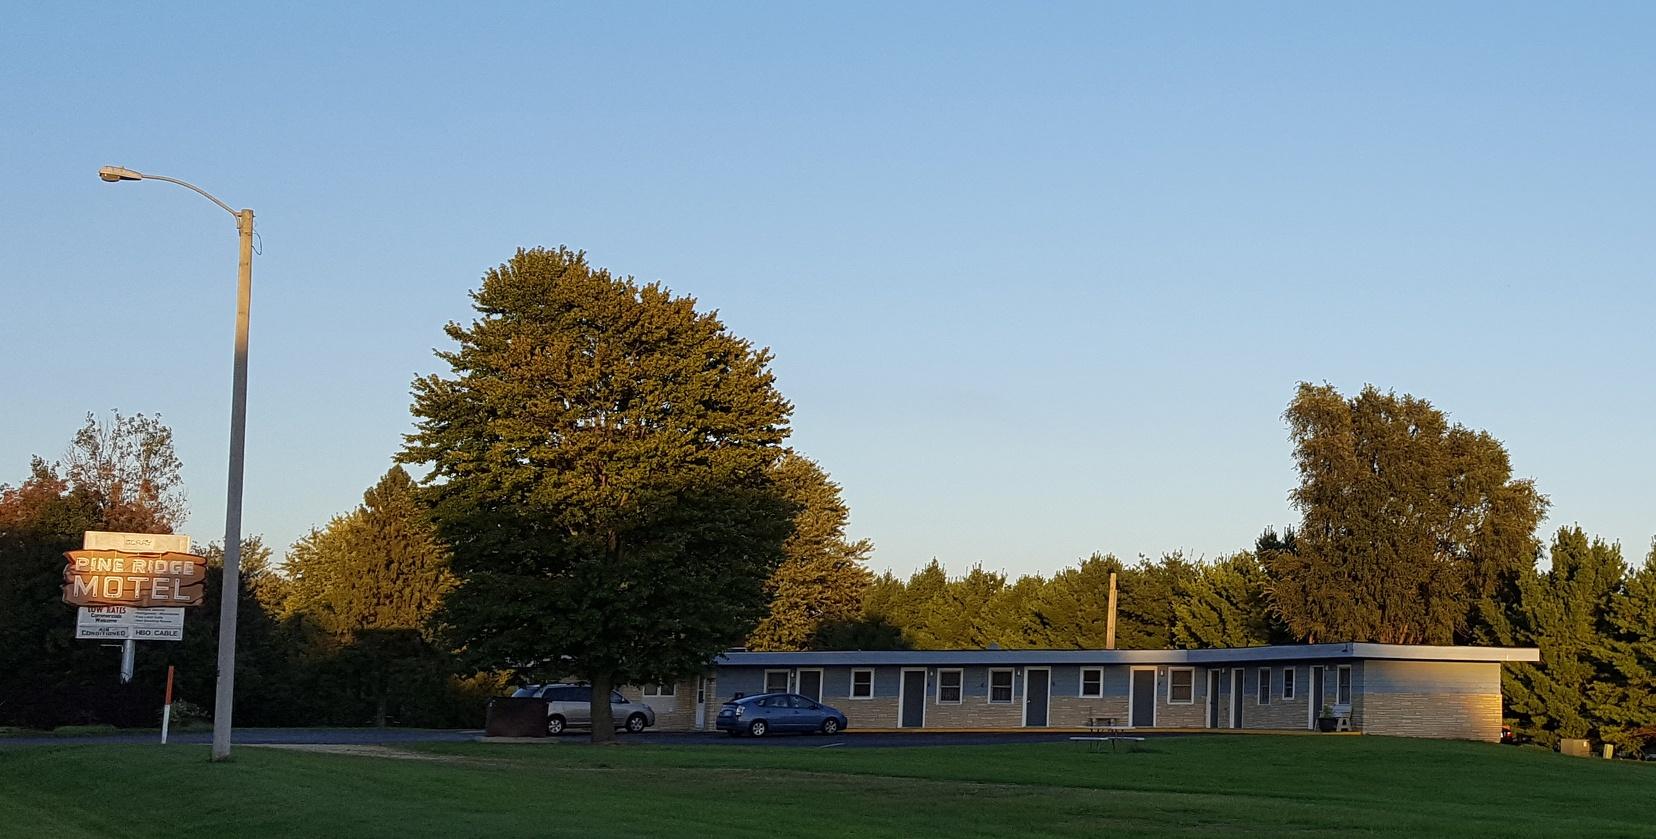 The Pine Ridge Motel.